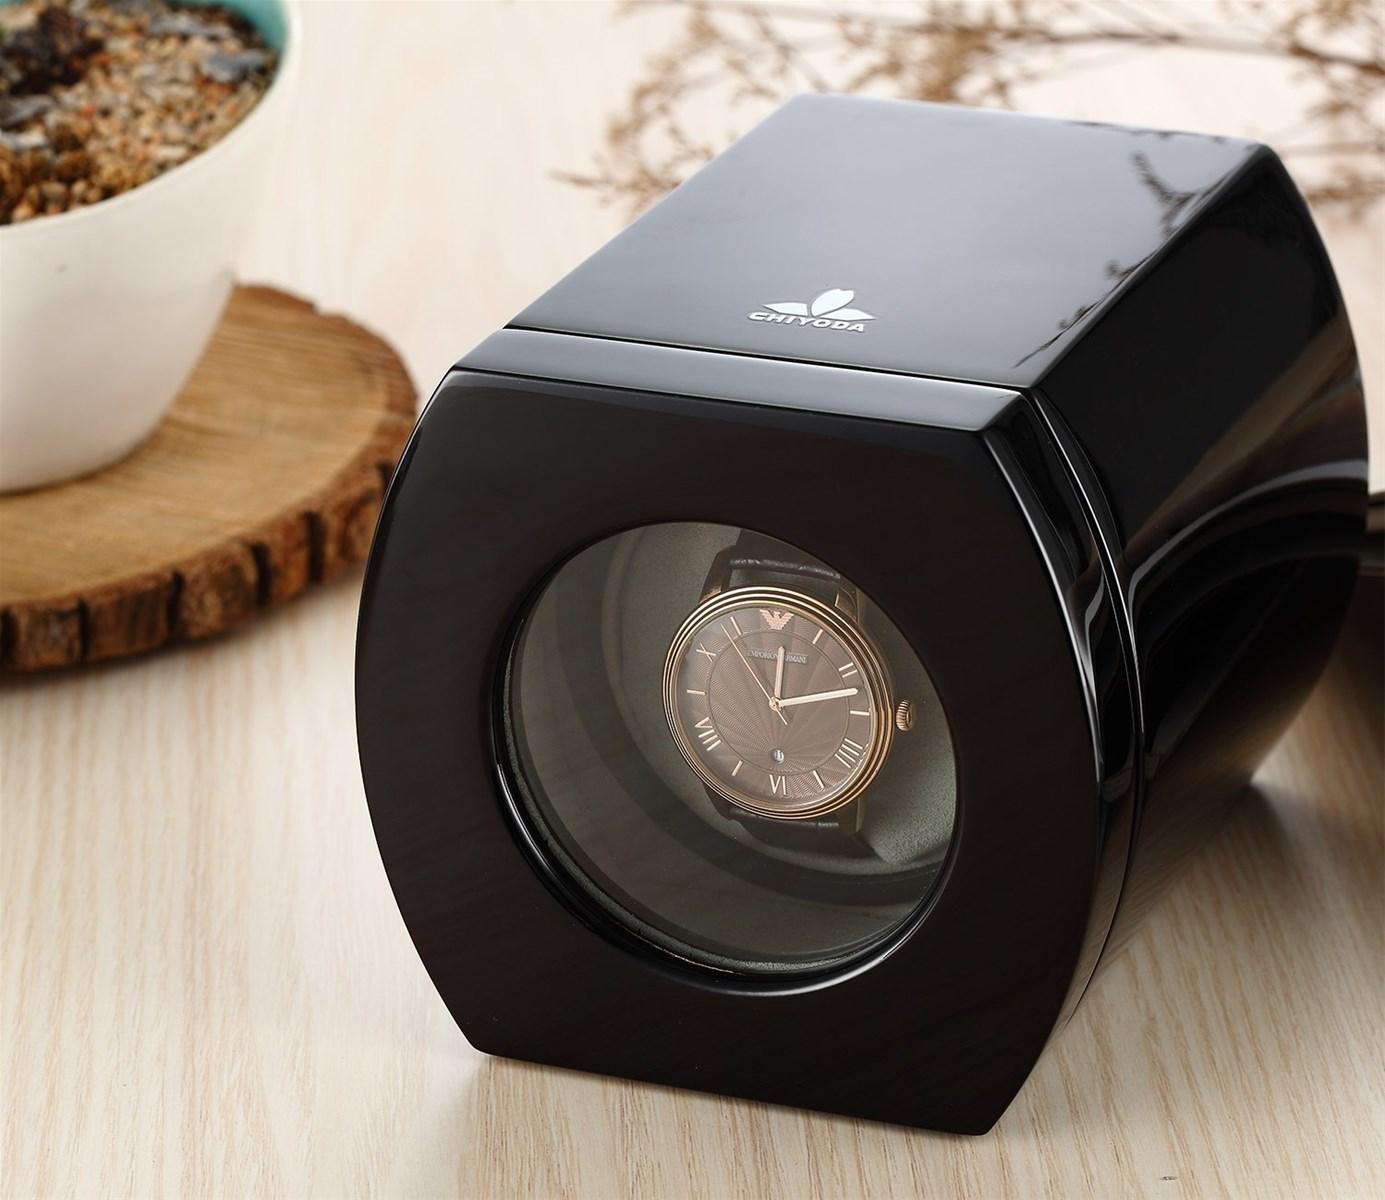 CHIYODA Automatic Single Watch Winder with Quiet Mabuchi Motor Black